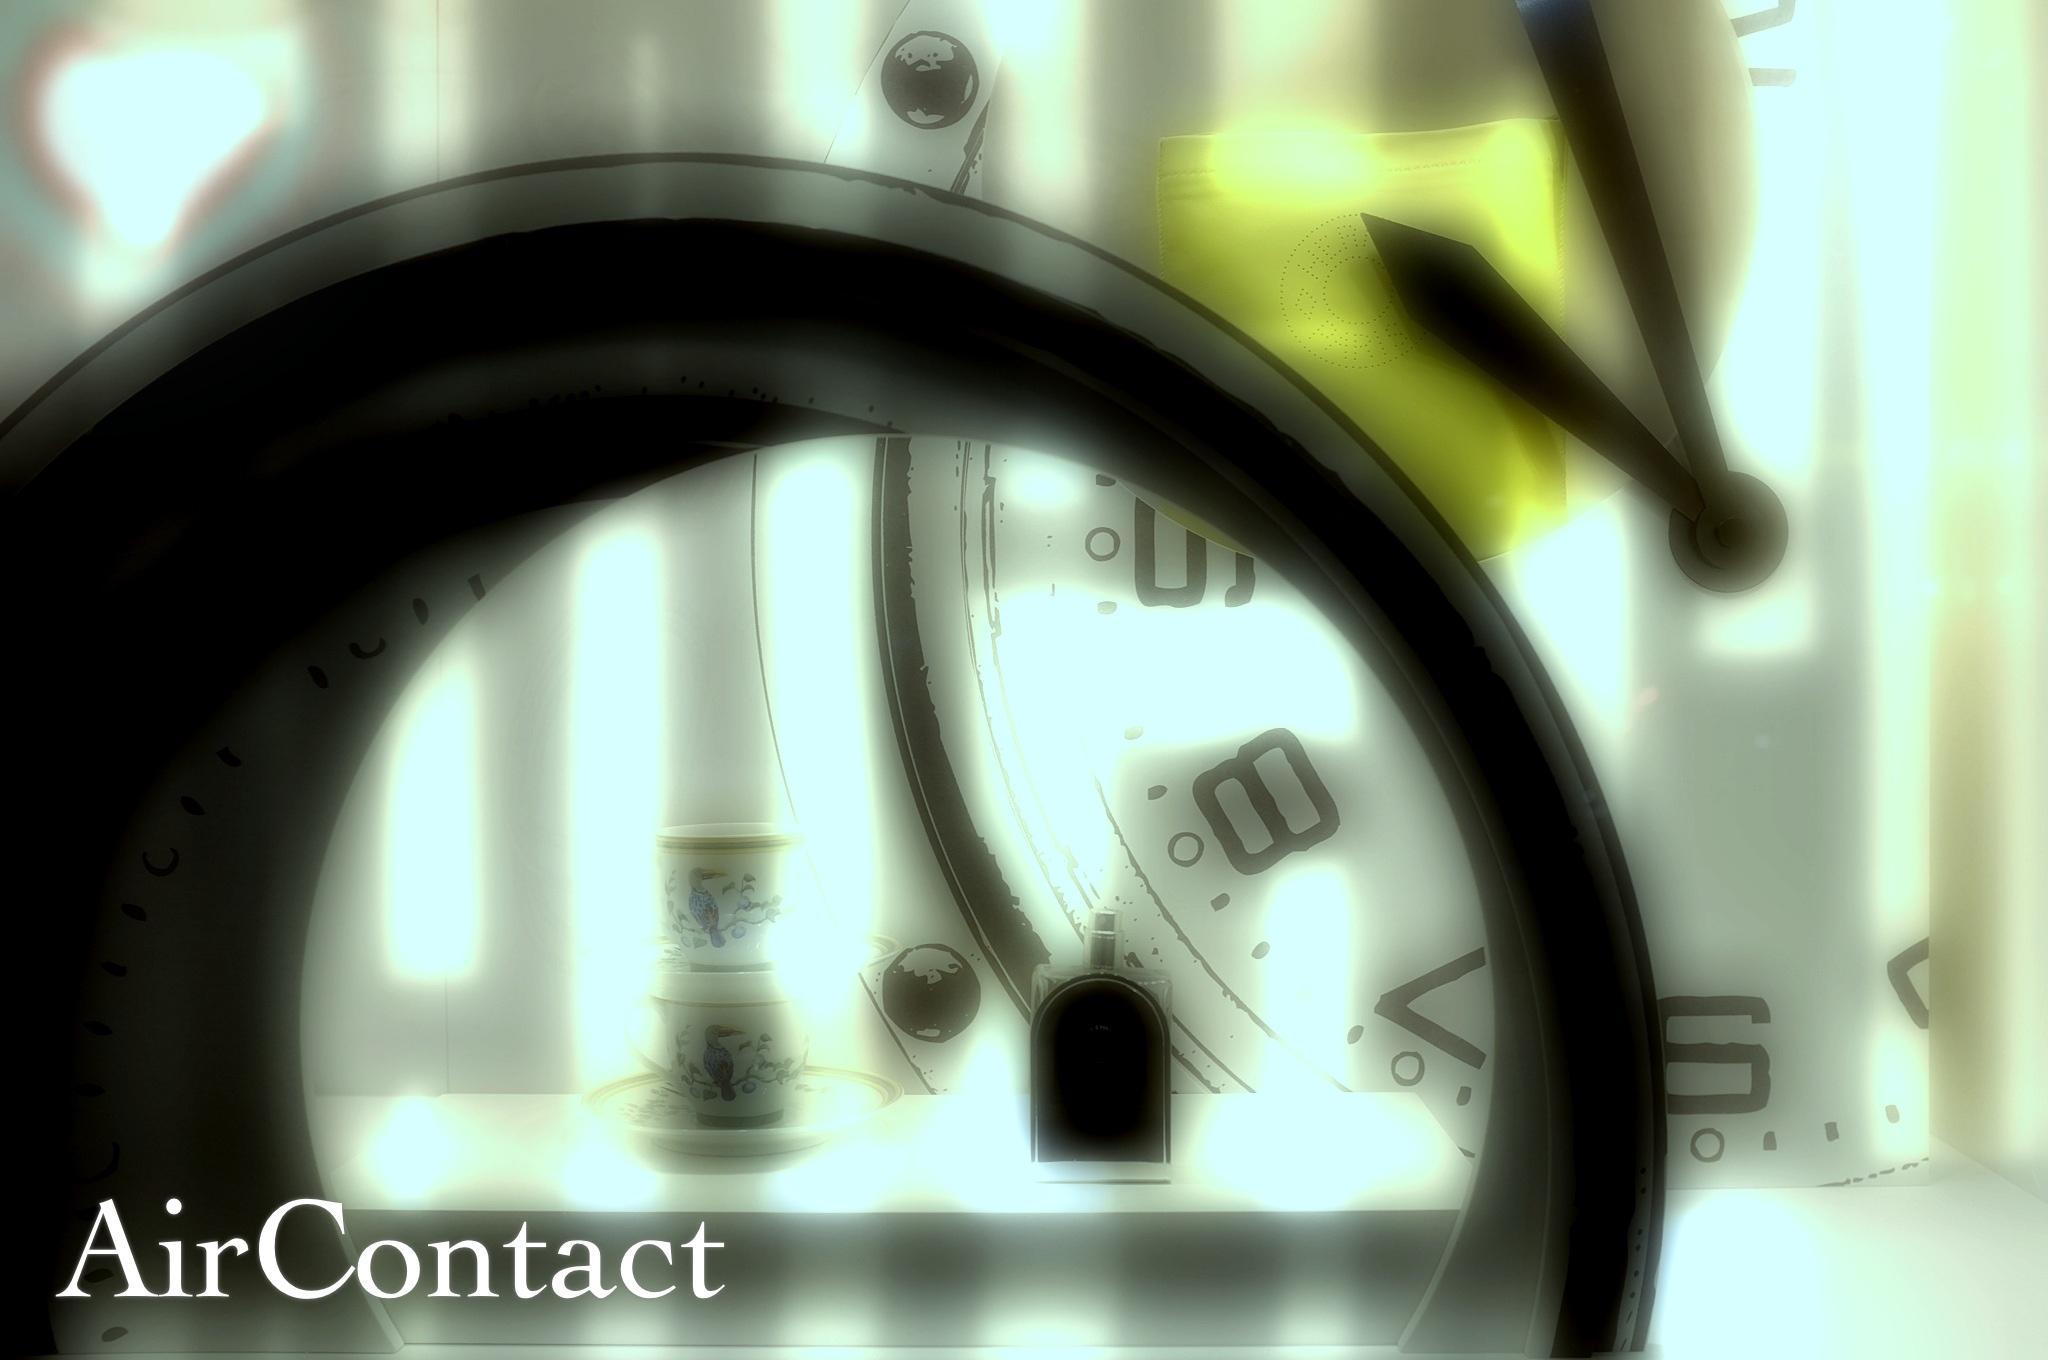 c0159490_332341.jpg